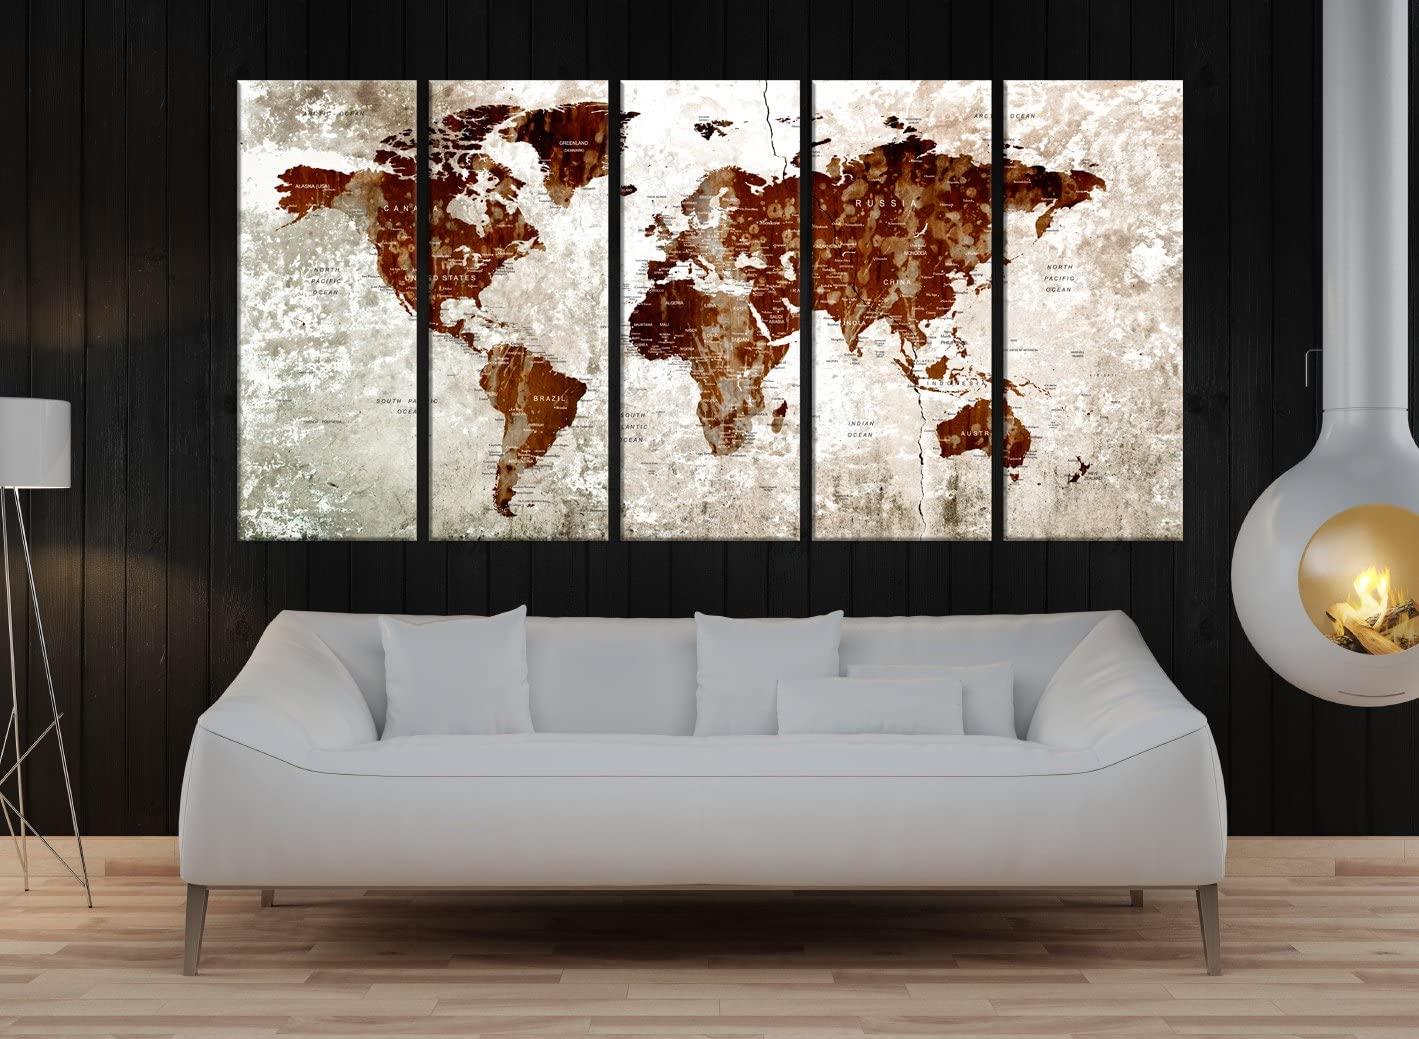 Large Wall Art, Push pin World Atlas Map Art Canvas print, Push pin Travel Map Wall Art, Large print, Artistic Wall Decor, Home and office wall decal, Bedroom Wall art decor, modern Wall Art k750